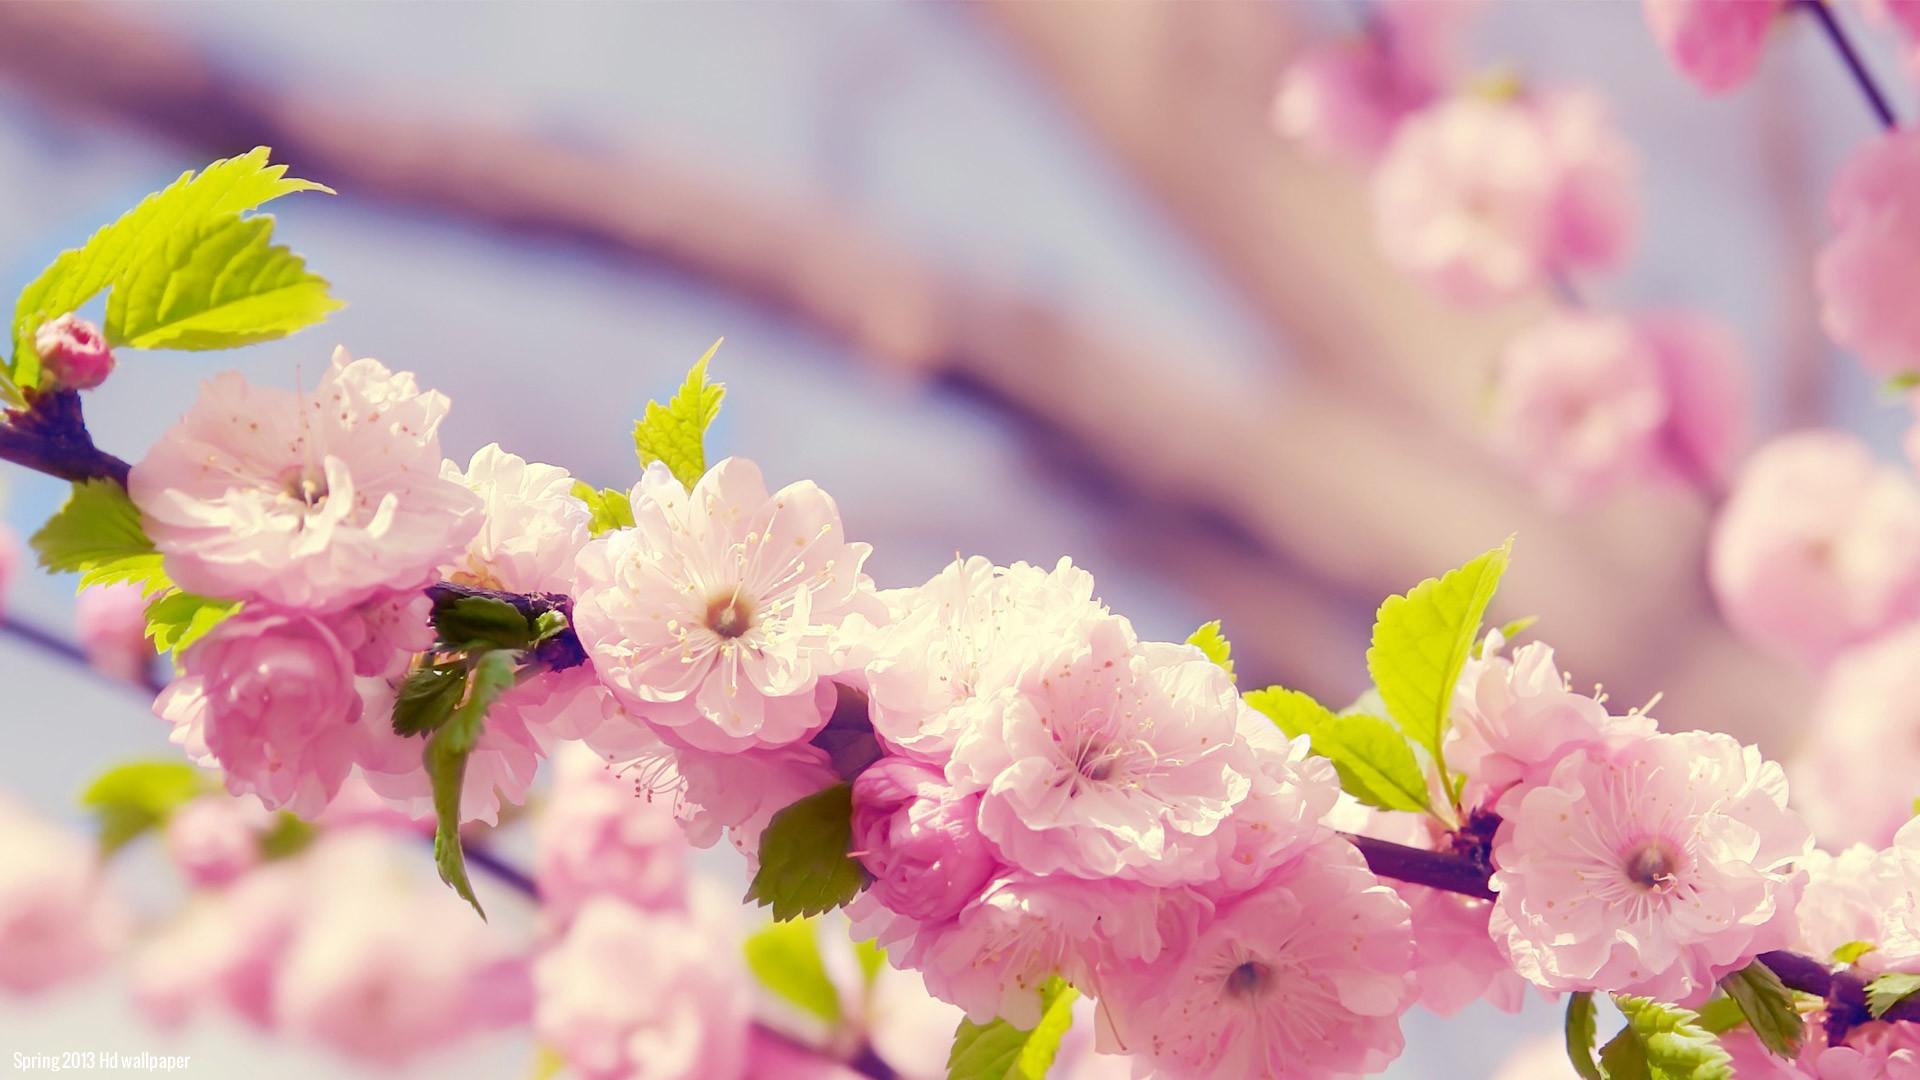 Flowers | Full HD Wallpapers, download 1080p desktop backgrounds